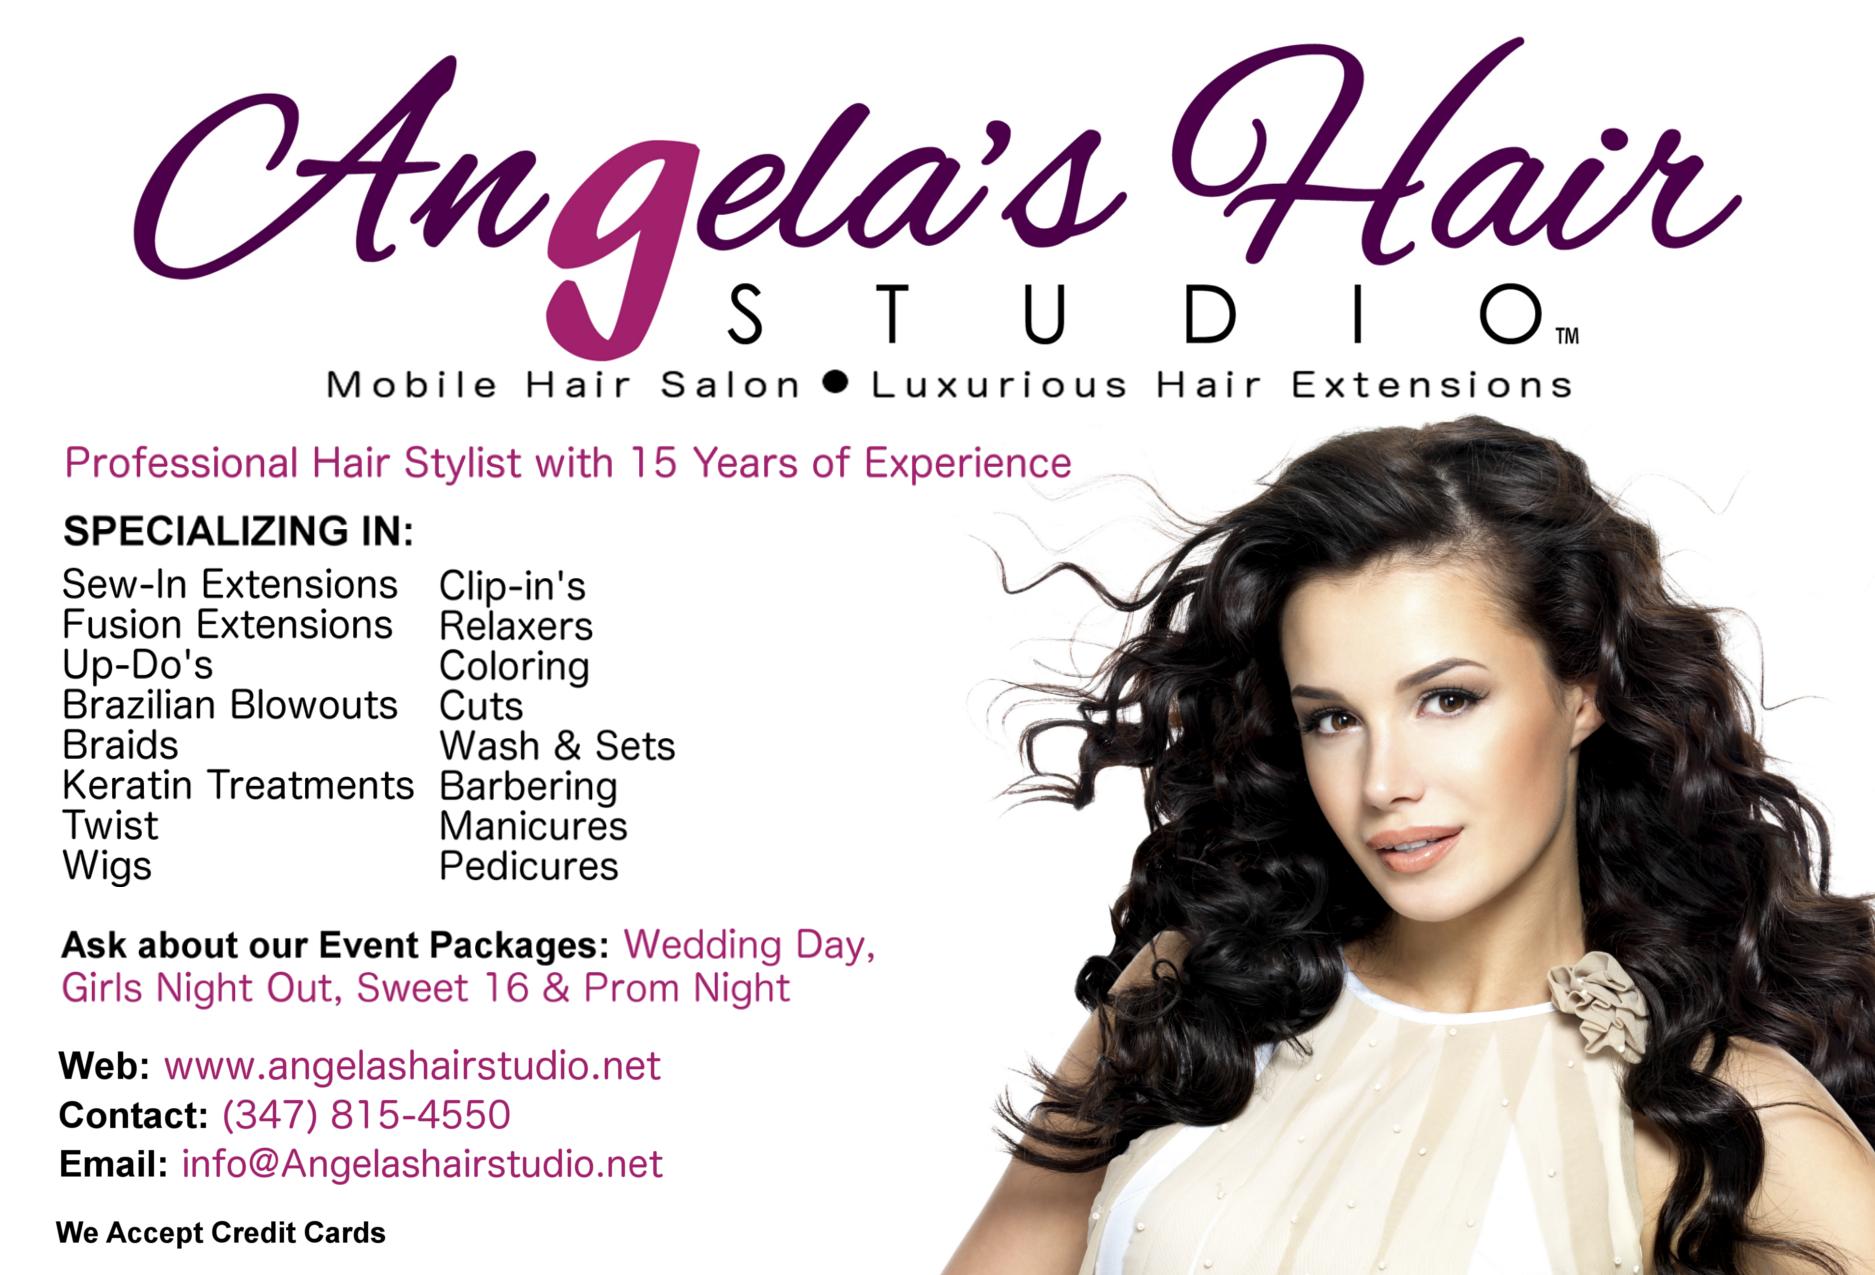 Angela's Hair Studio flyer! | Angela's Hair Studio: Mobile Hair ...